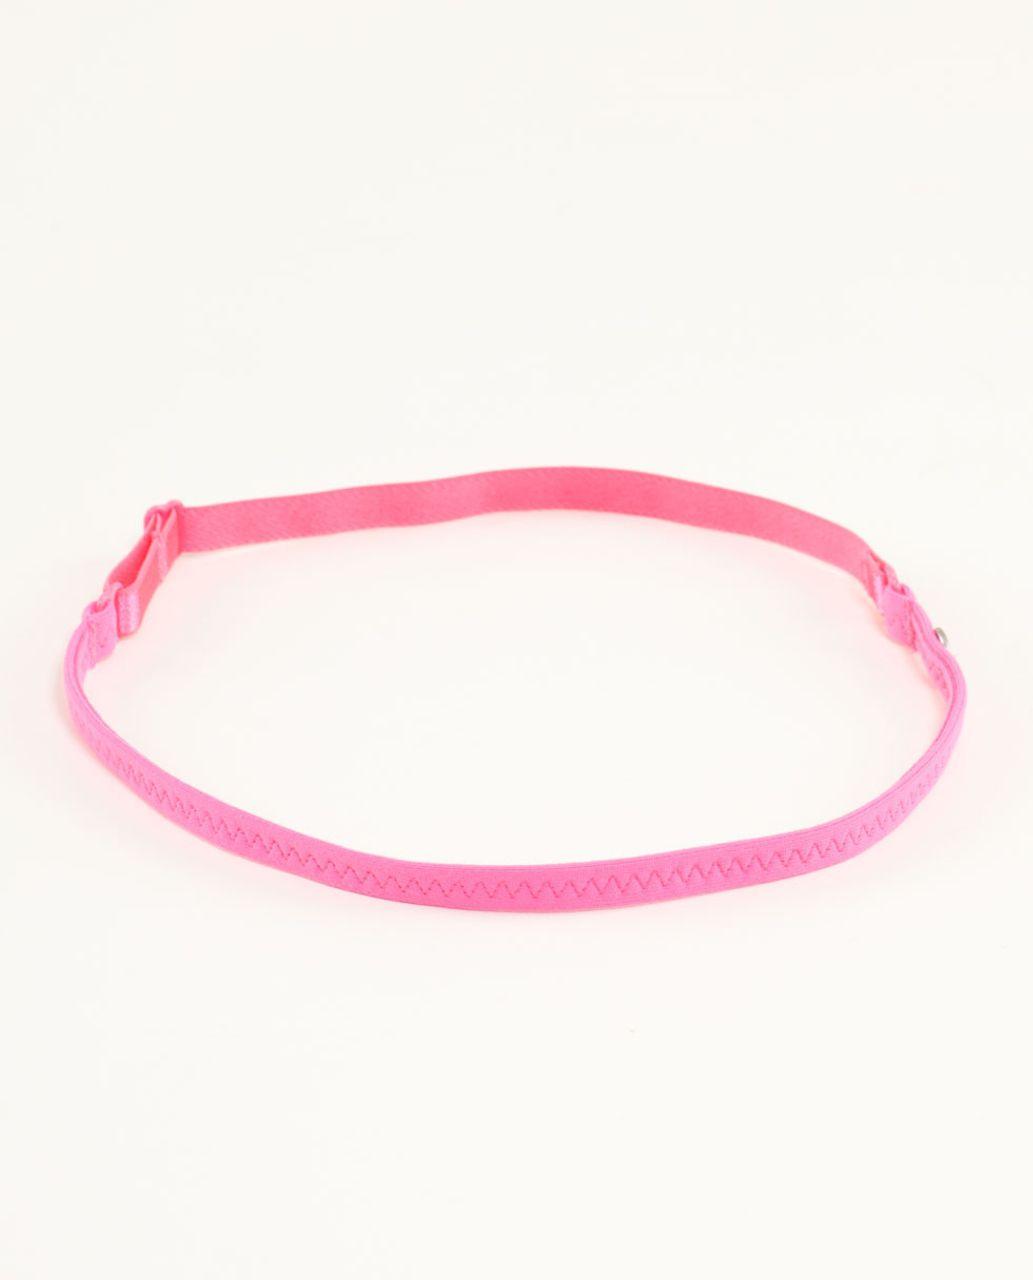 Lululemon Strappy Headband - Pinkelicious